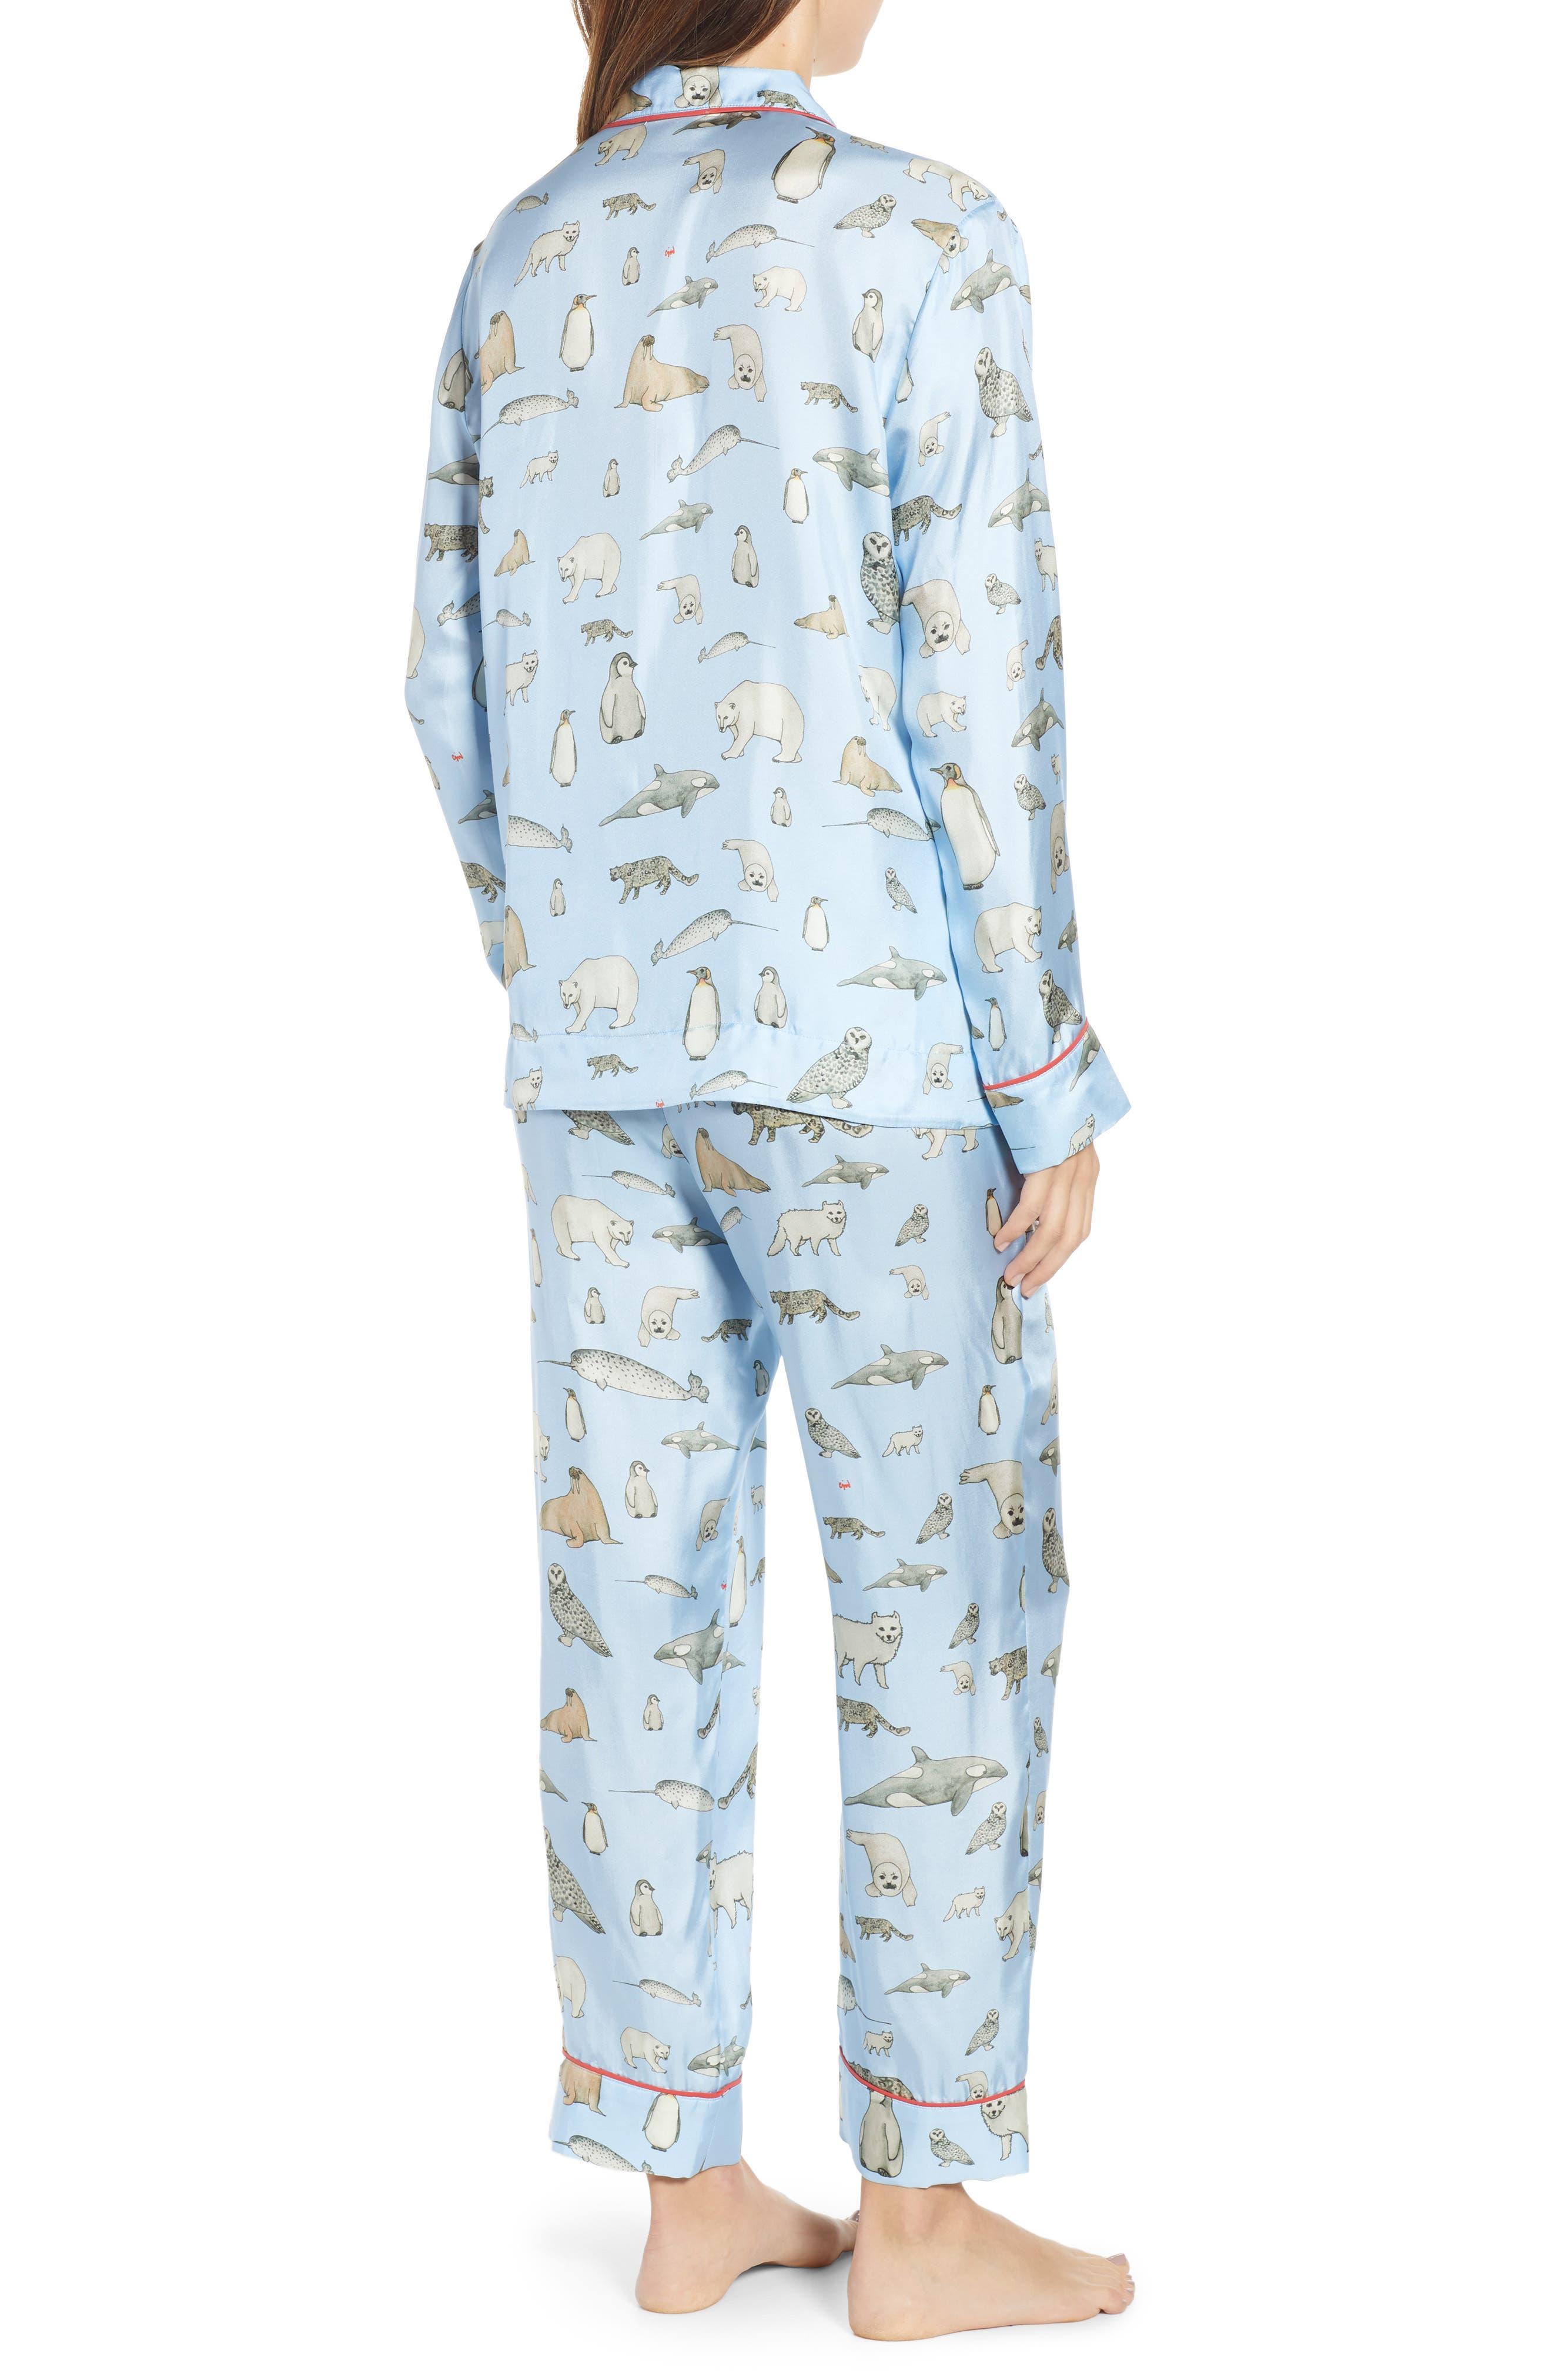 Winter Animals Pajamas & Eye Mask,                             Alternate thumbnail 2, color,                             LIGHT BLUE